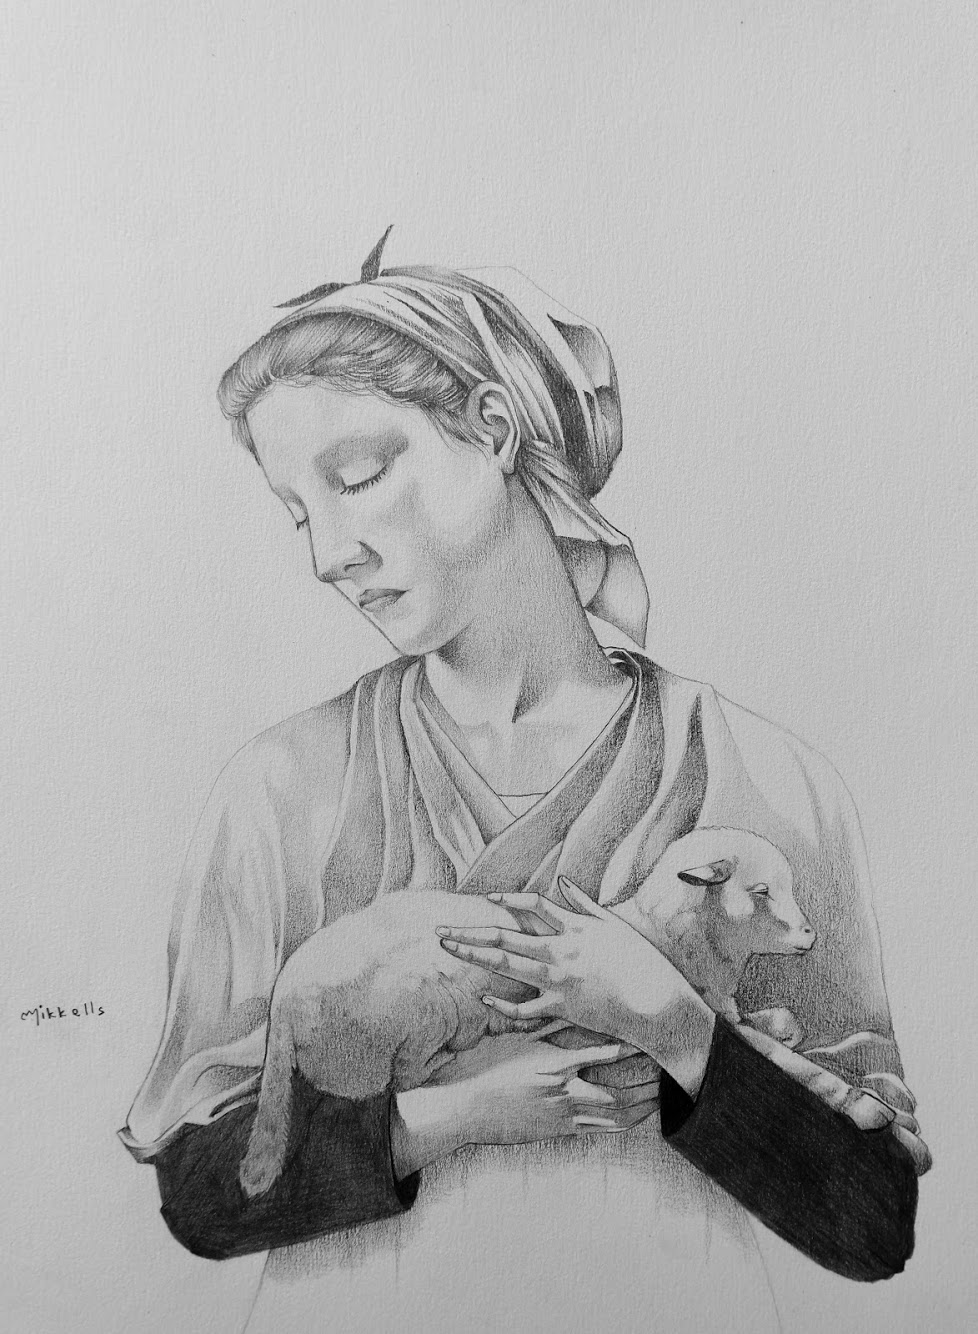 William Bouguereau Shepherd Pencil Artwork